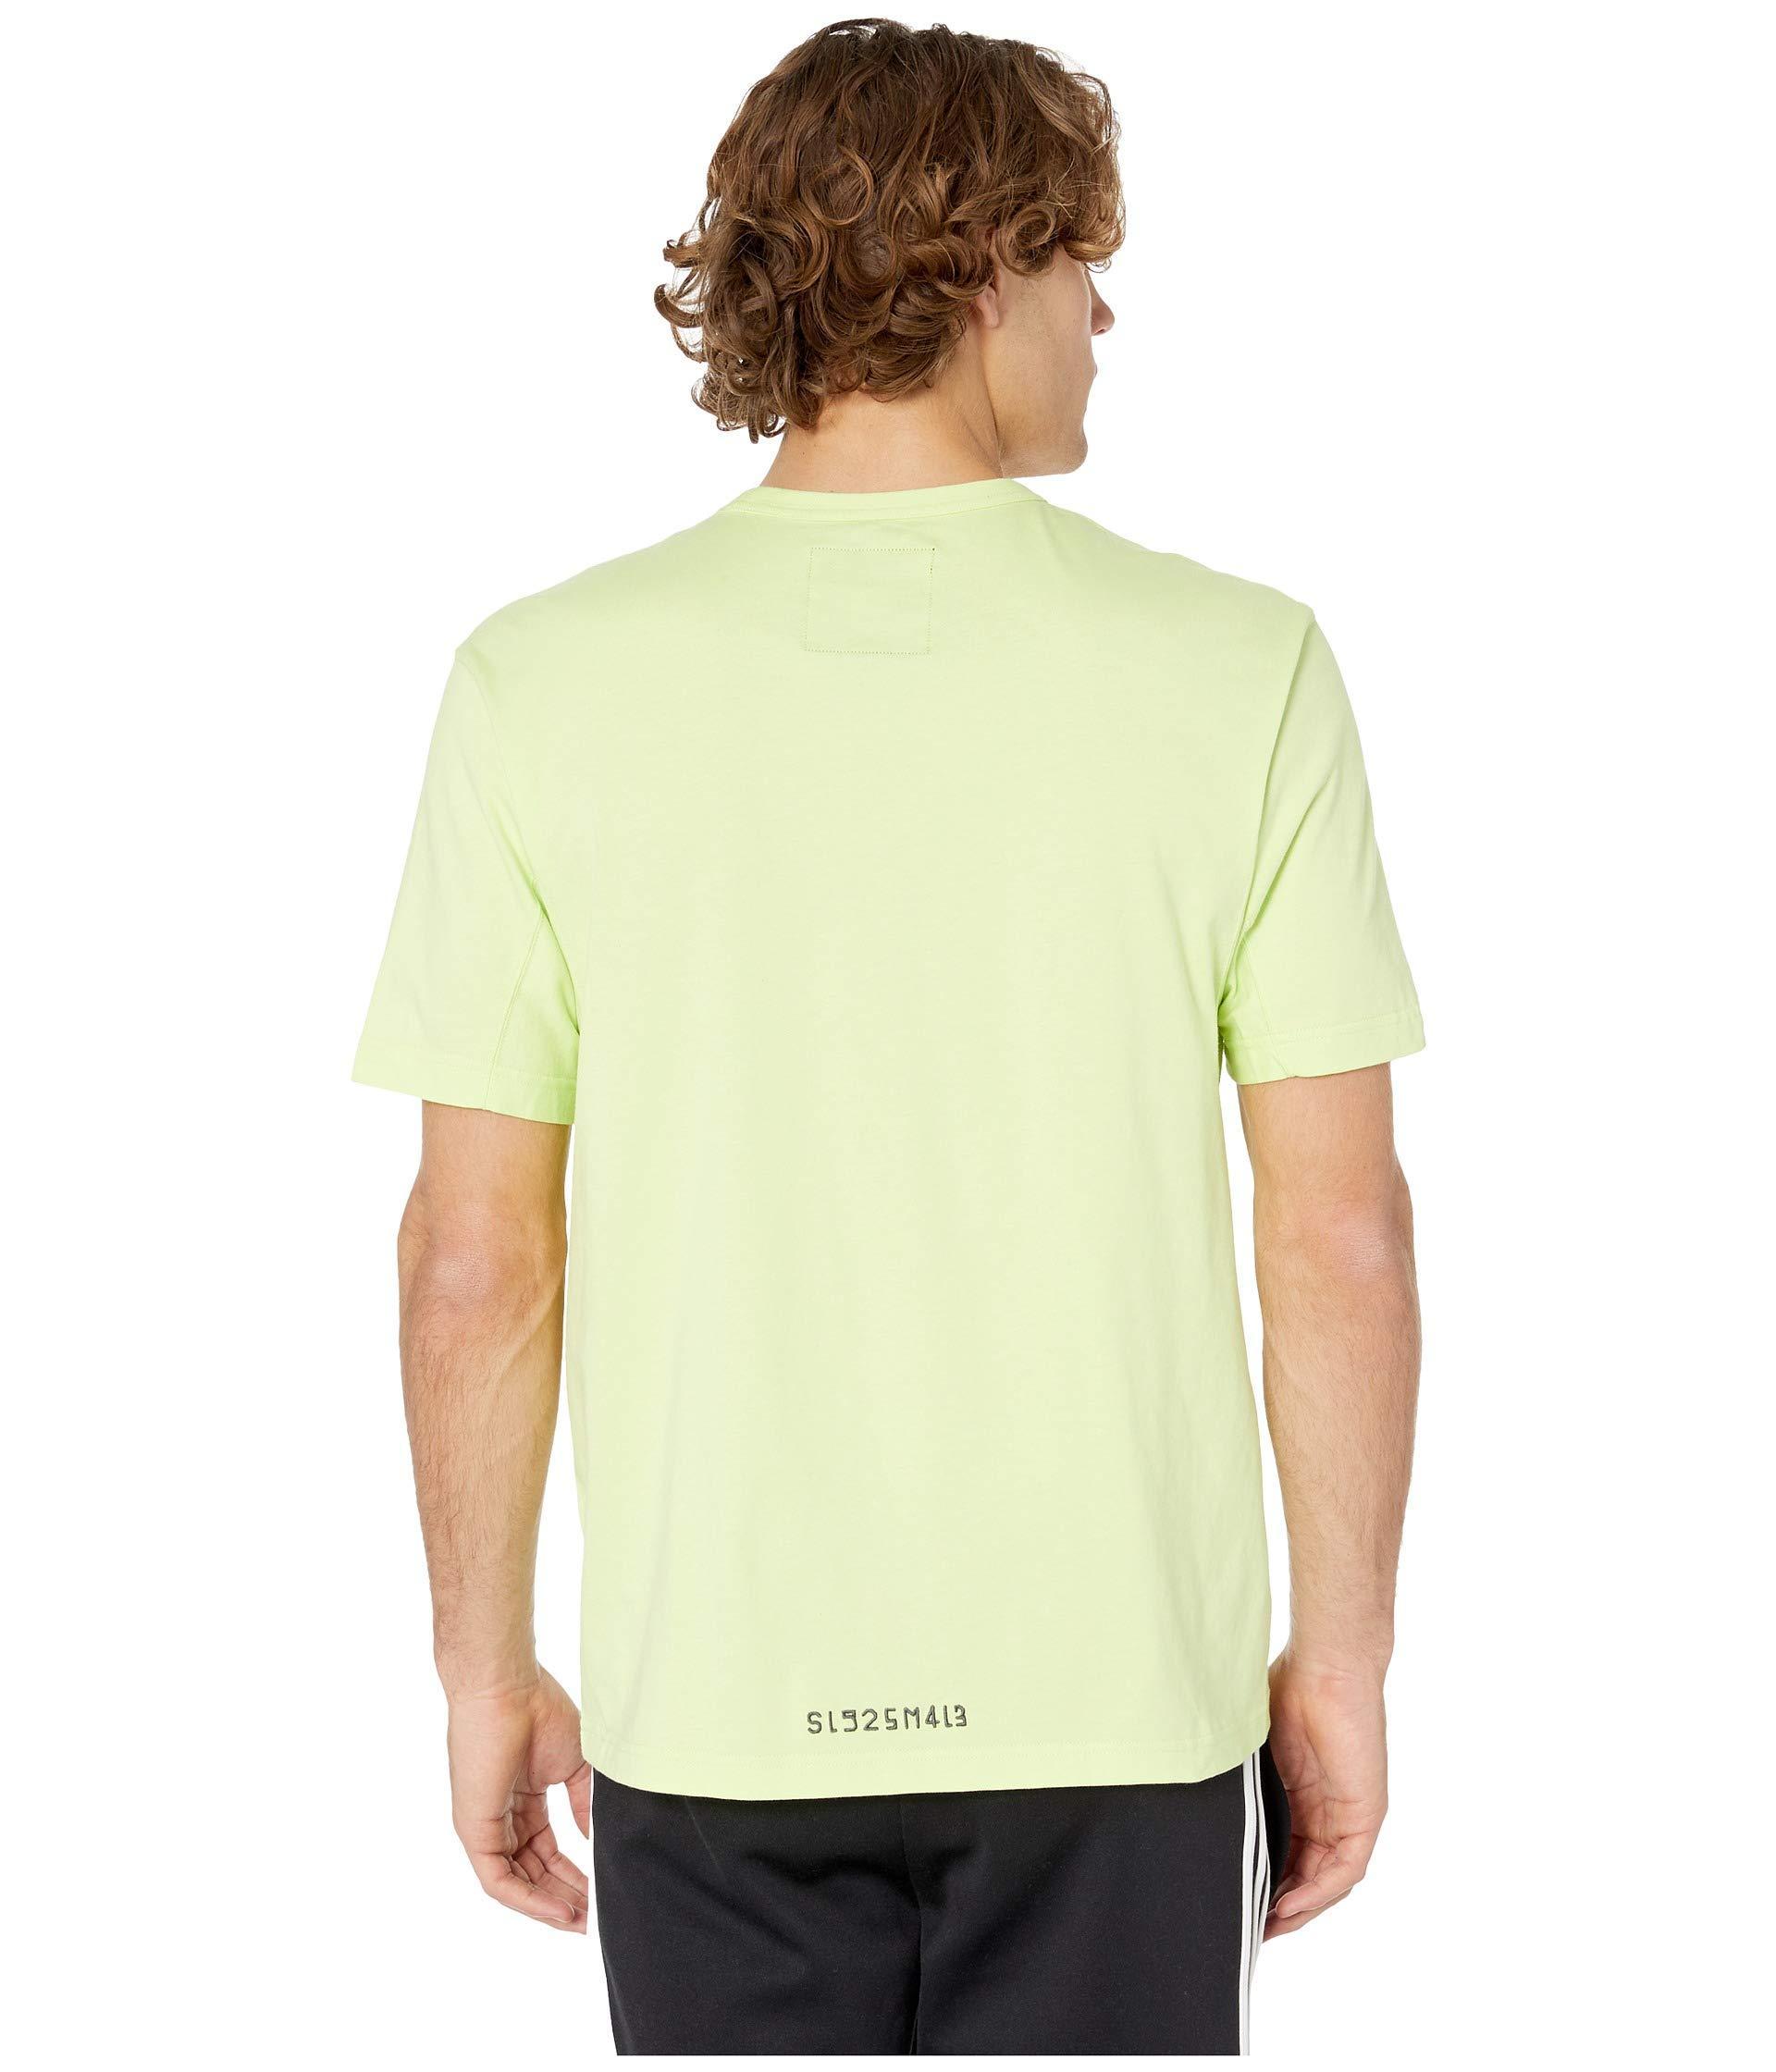 75734c1a5b4 adidas Originals Kaval Graphic Tee (semi Frozen Yellow) Men's T ...